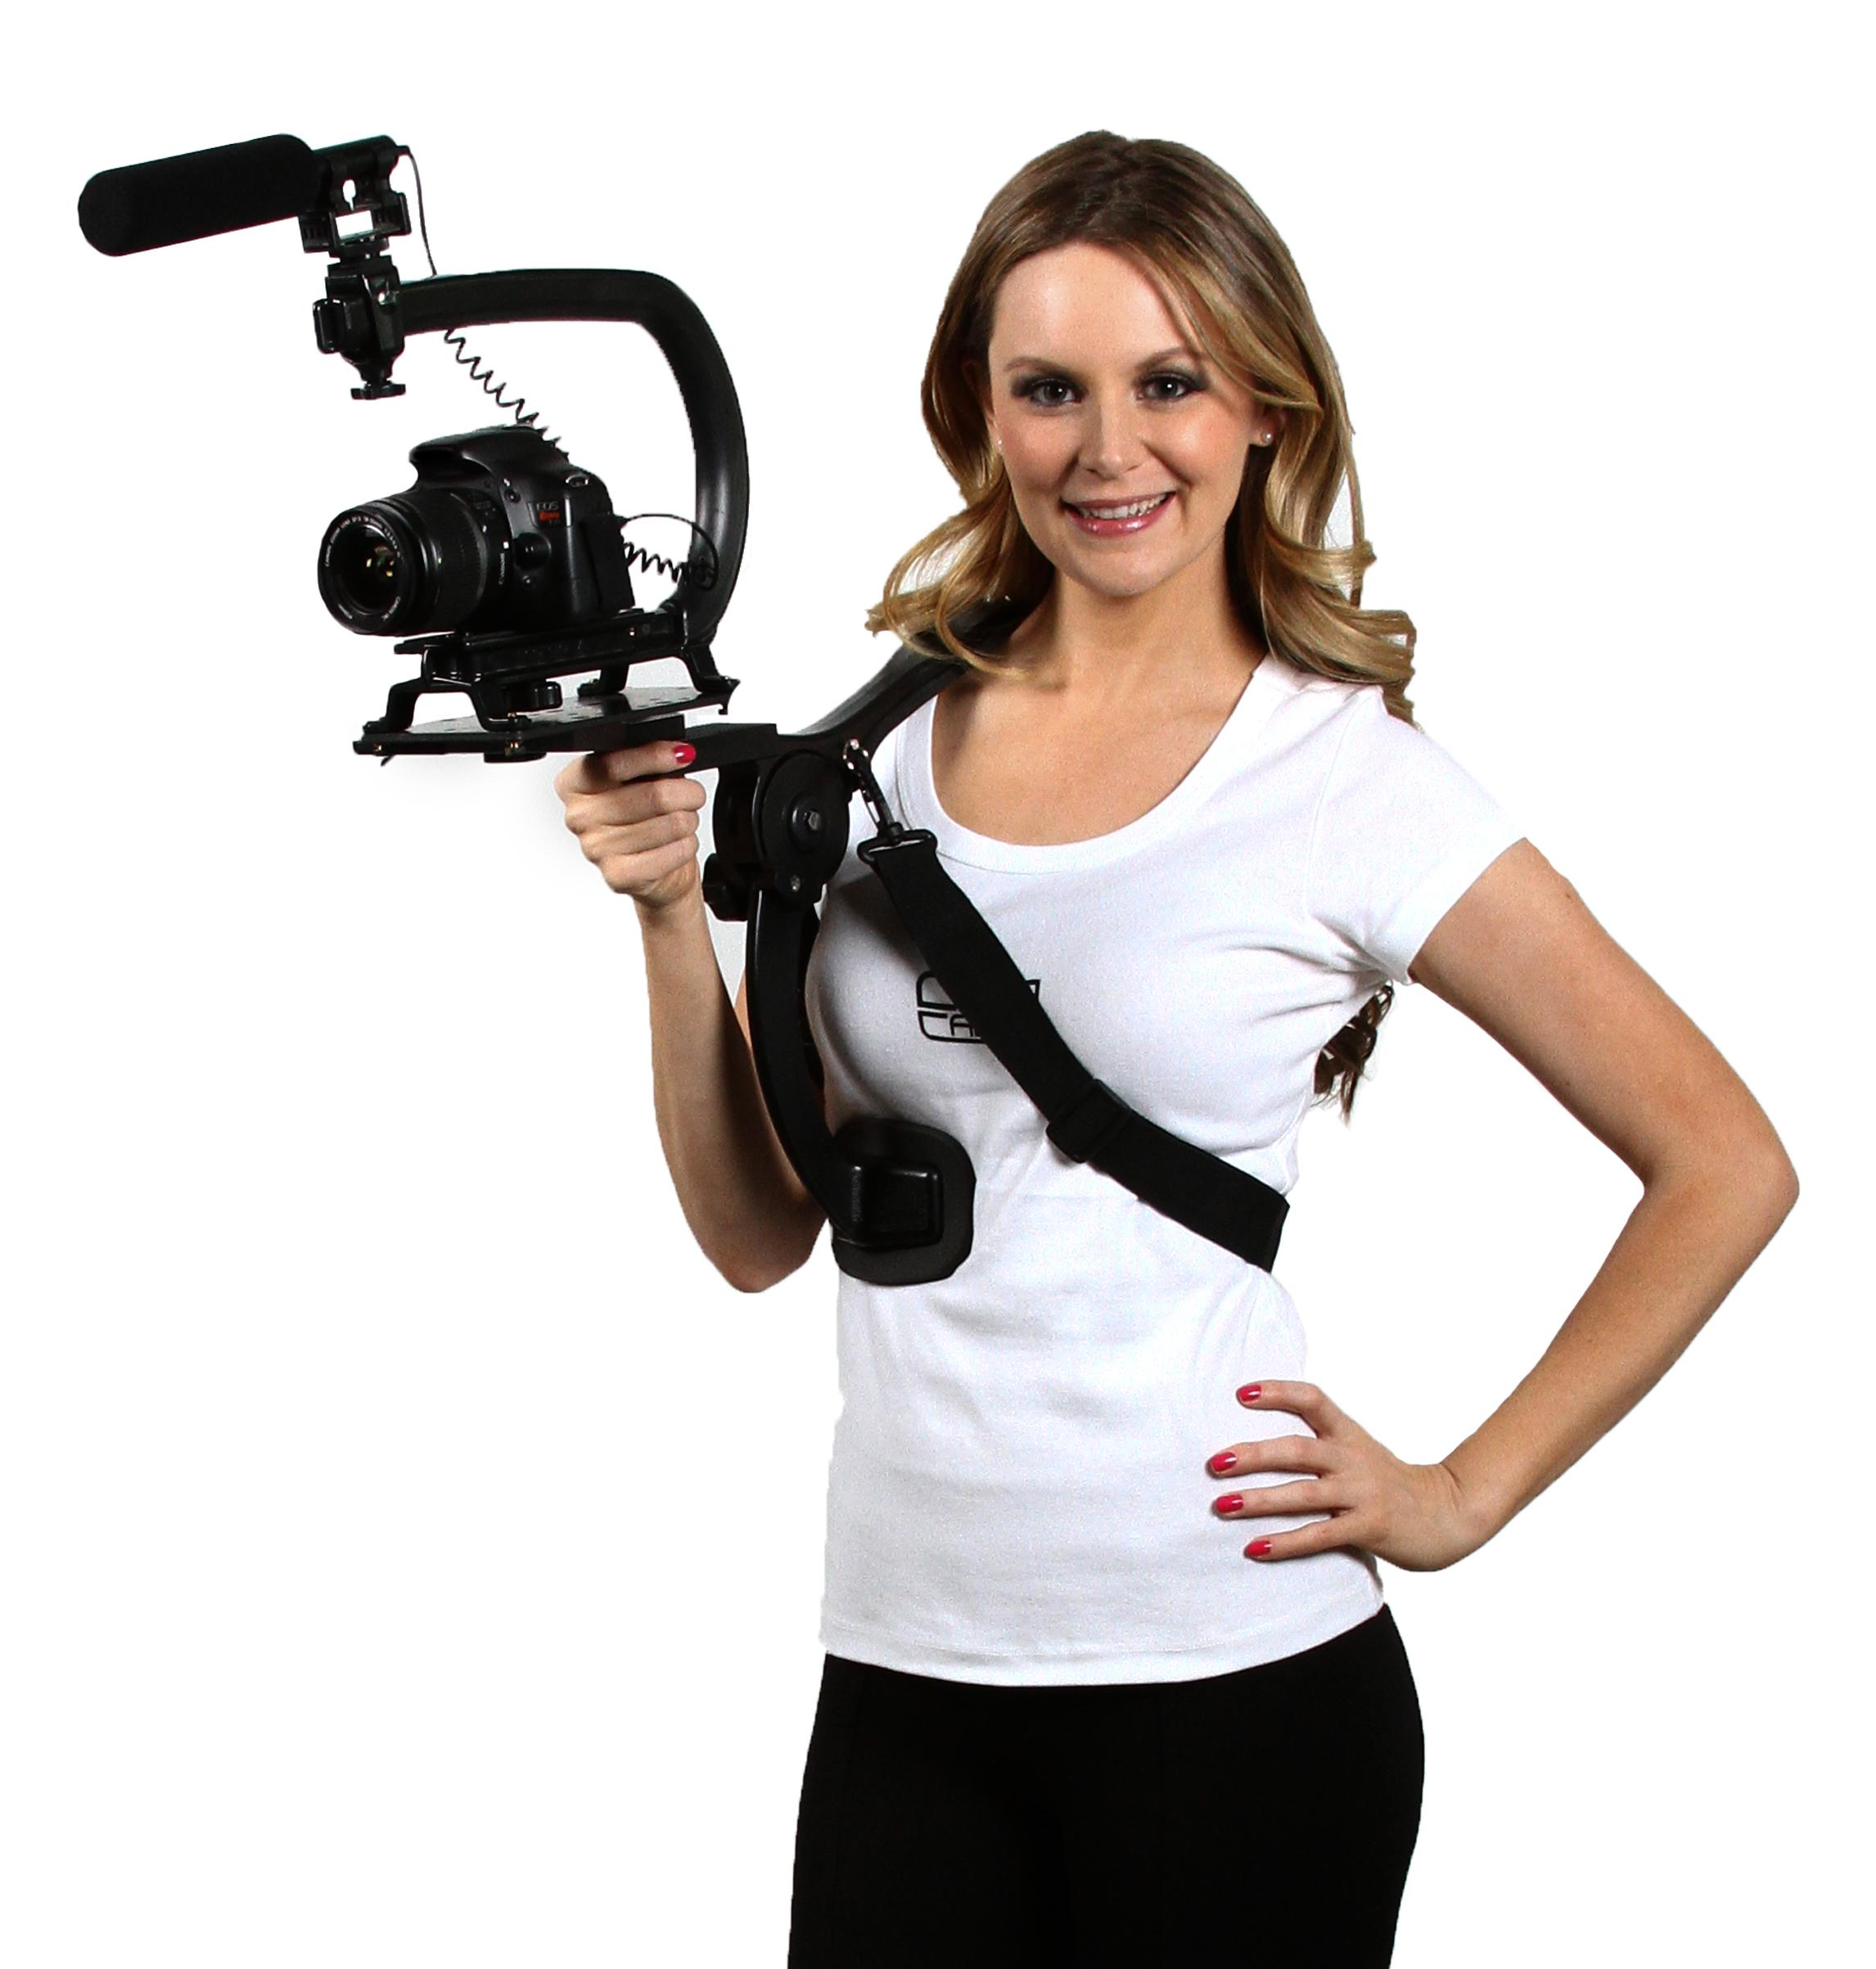 Amazon.com : Cam Caddie Scorpion EX Shoulder Support Kit W